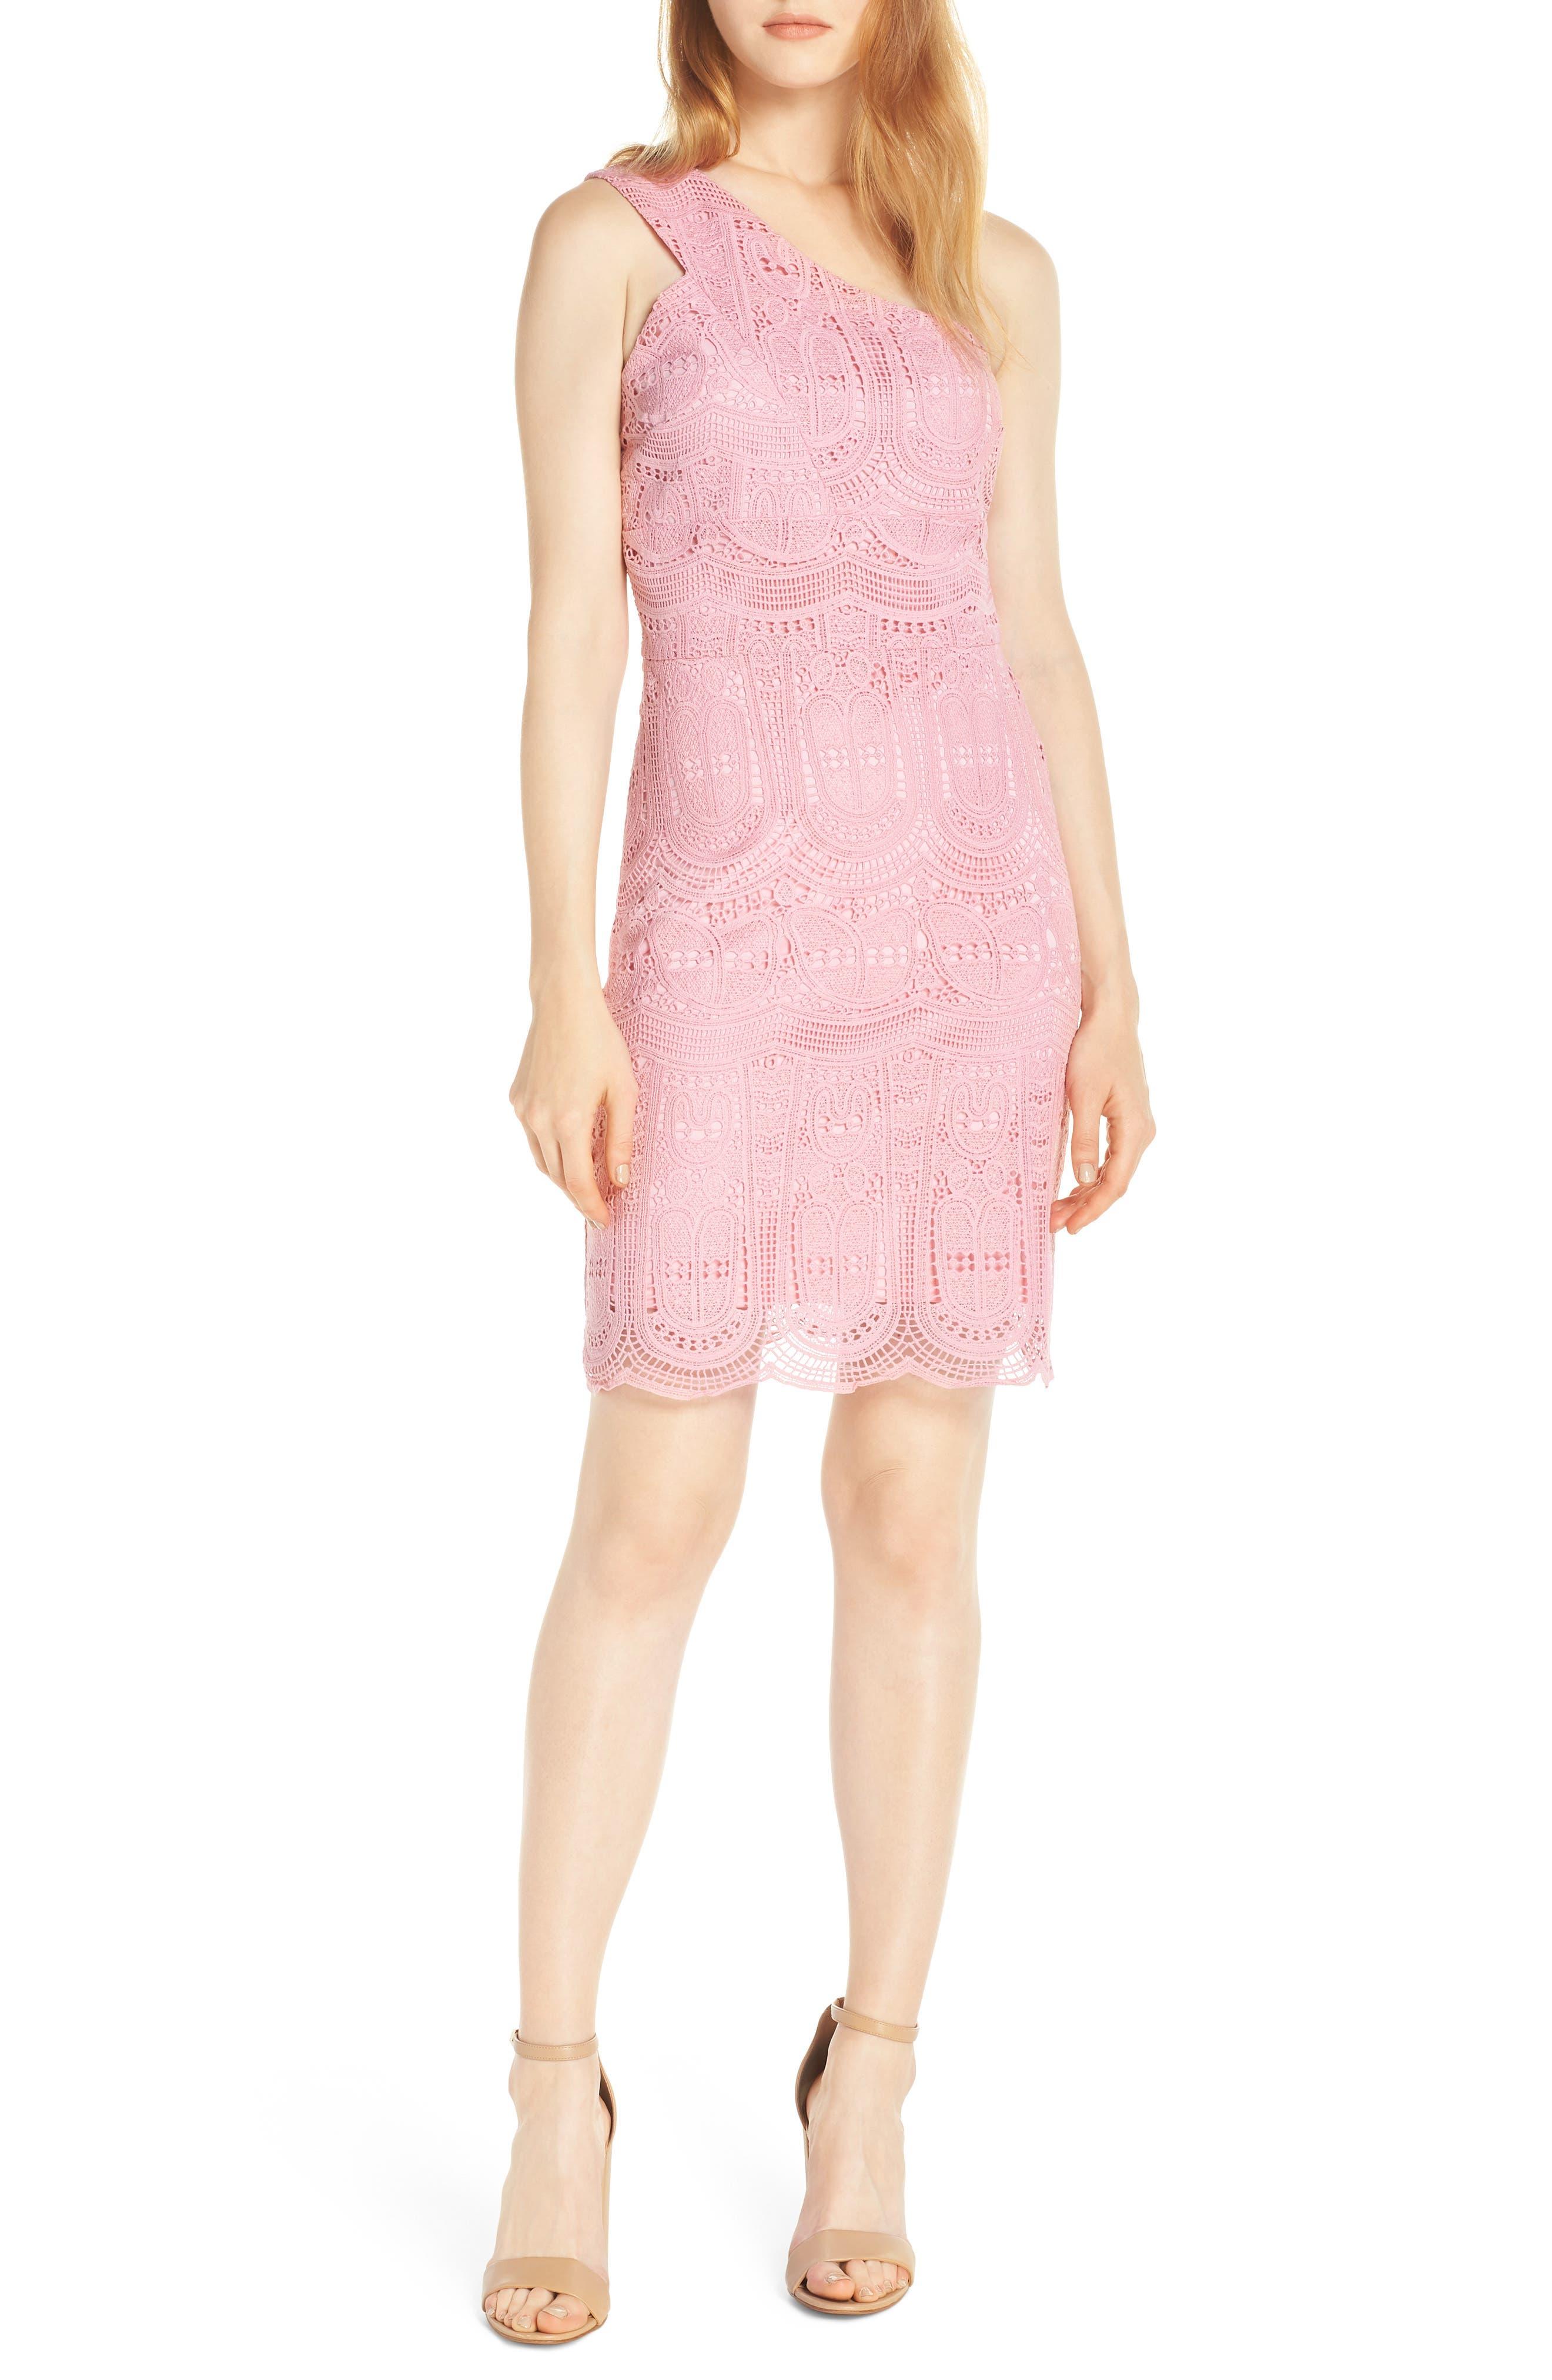 Nsr Grace One-Shoulder Lace Sheath Dress, Pink